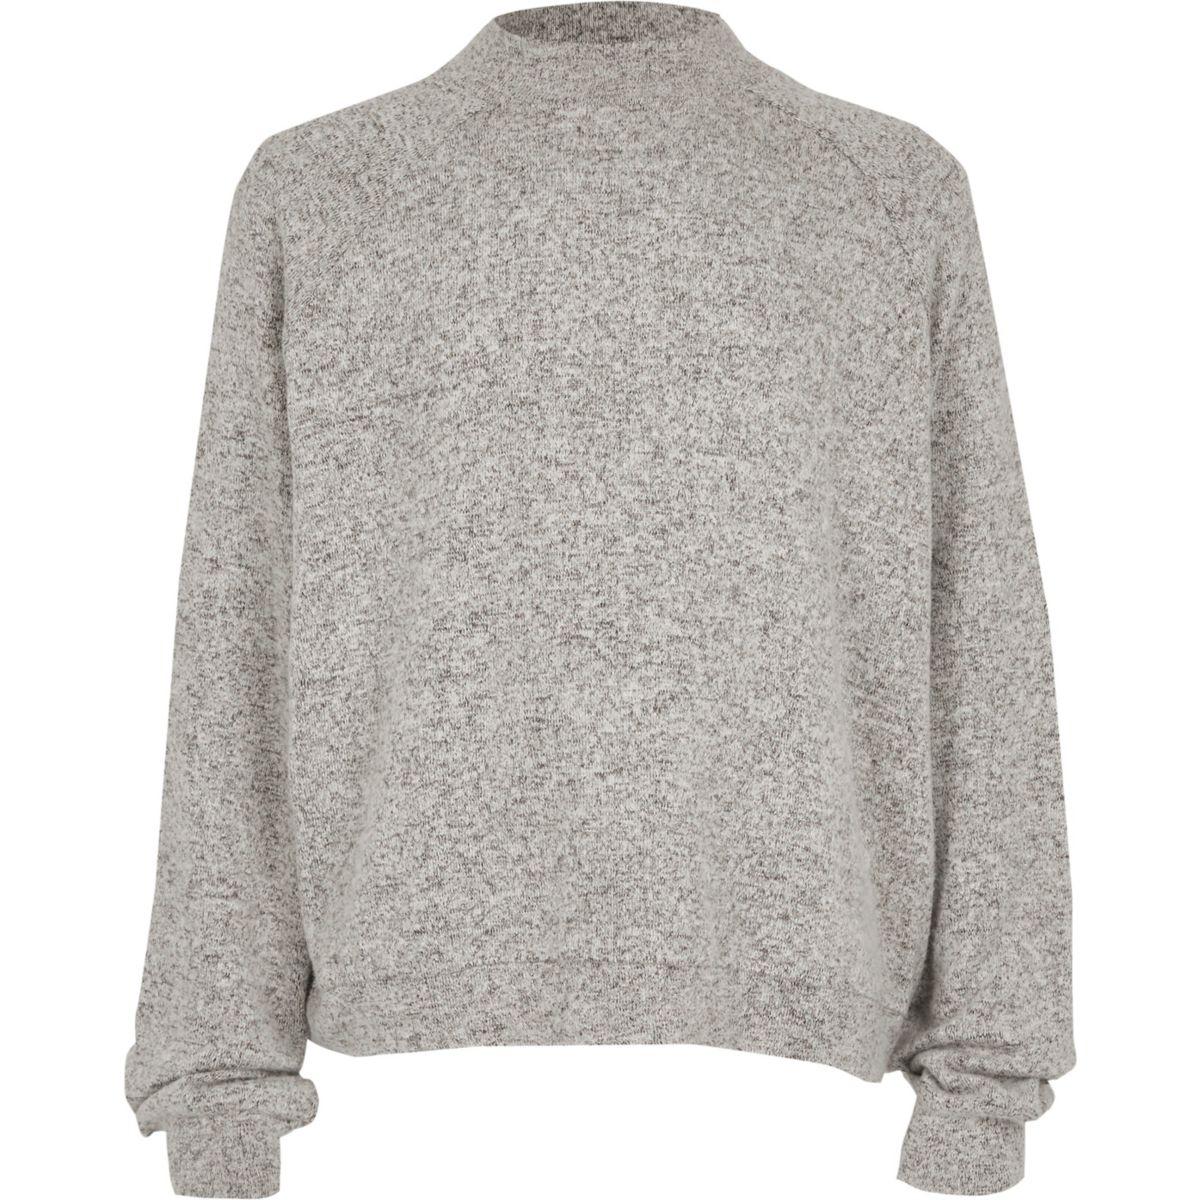 Girls grey high neck soft knit top